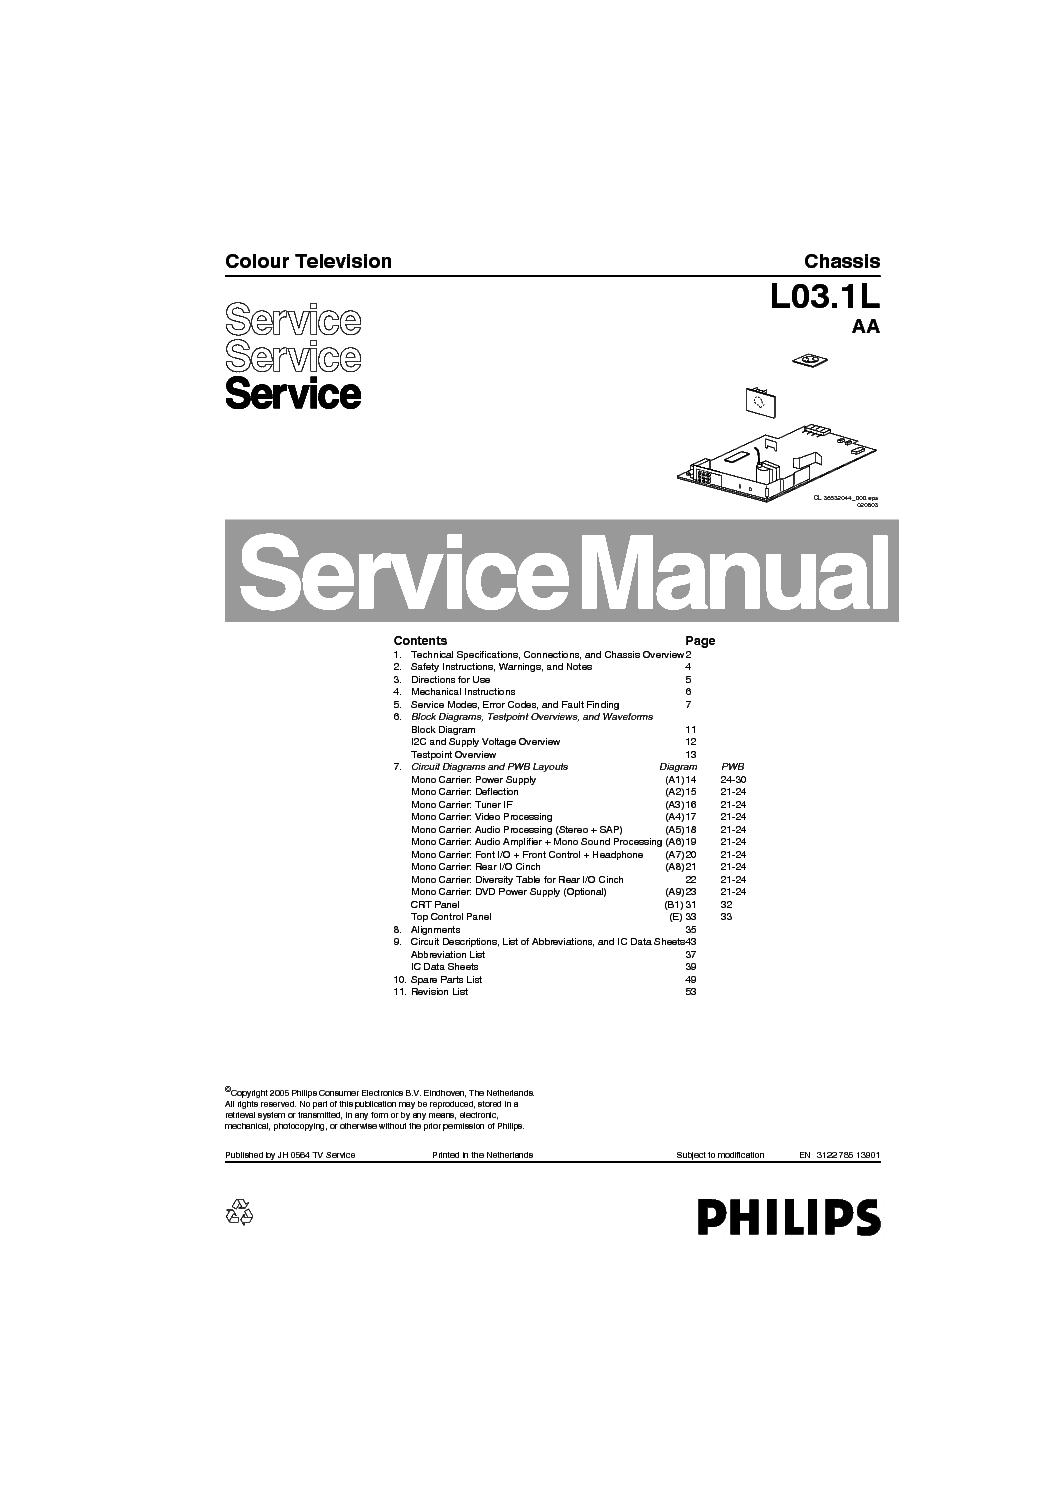 philips chassis q551 1e la service manual free download  schematics  eeprom  repair info for